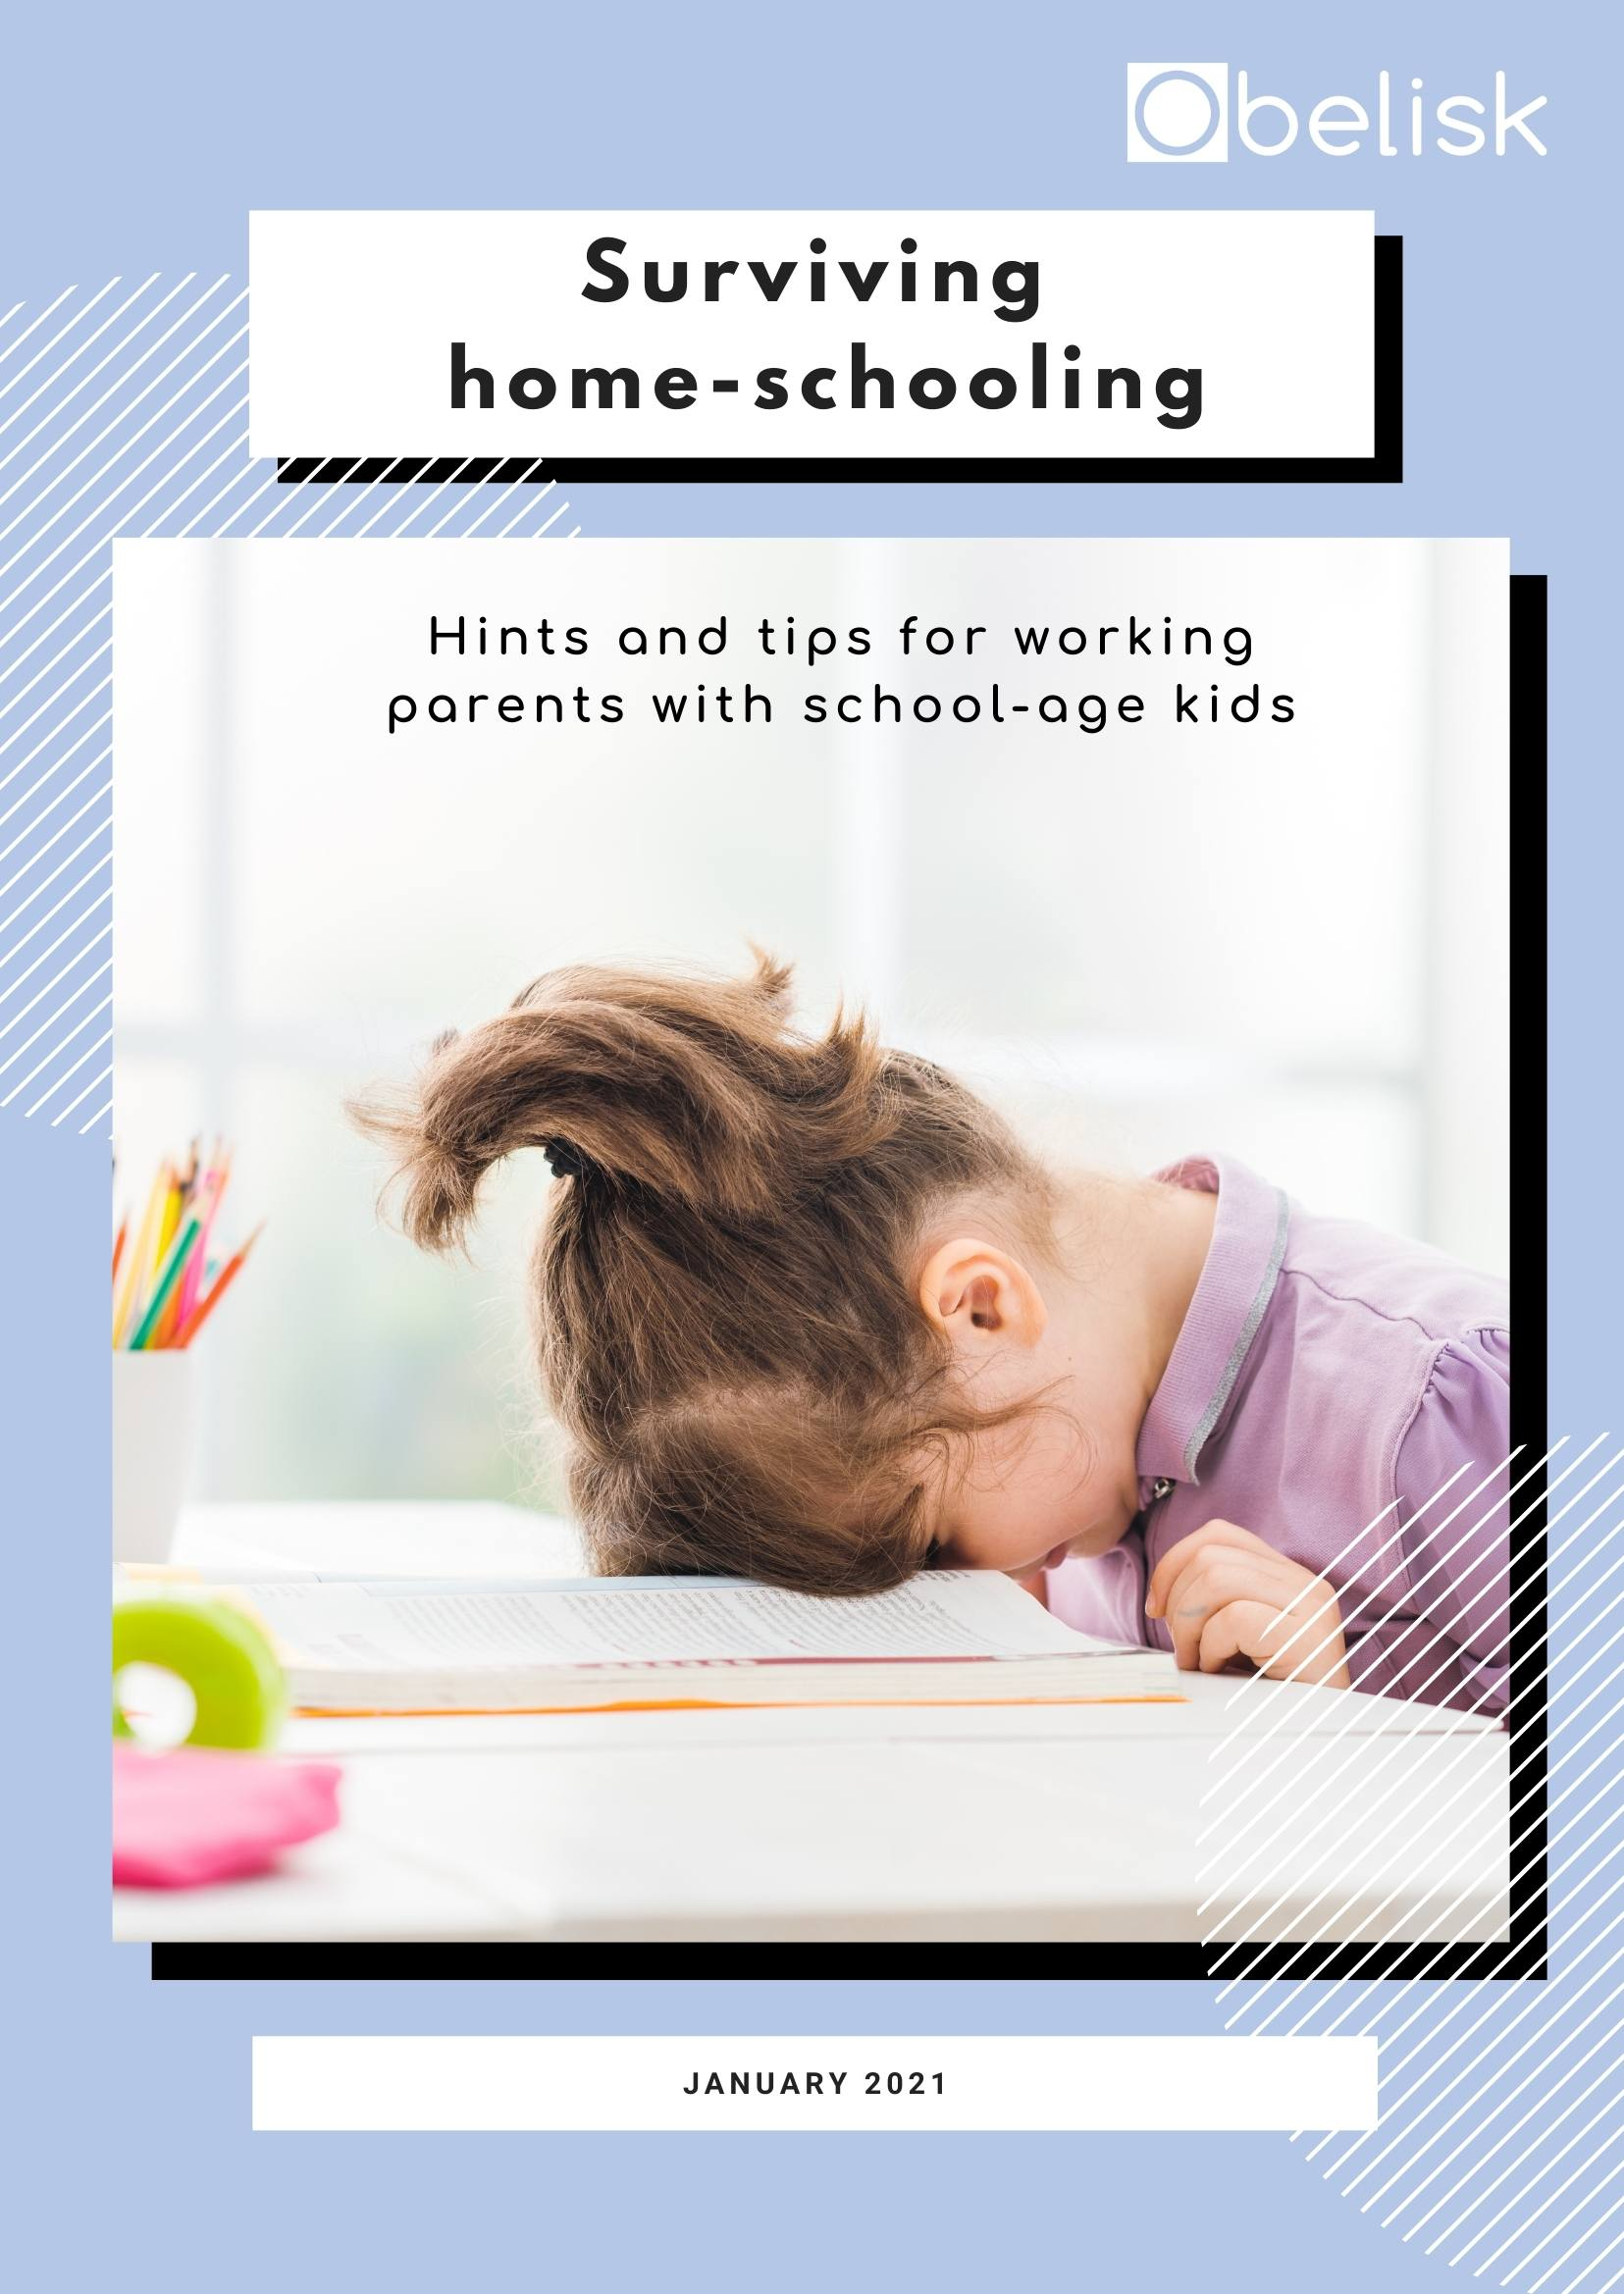 Front cover of Obelisk tips for home-schooling